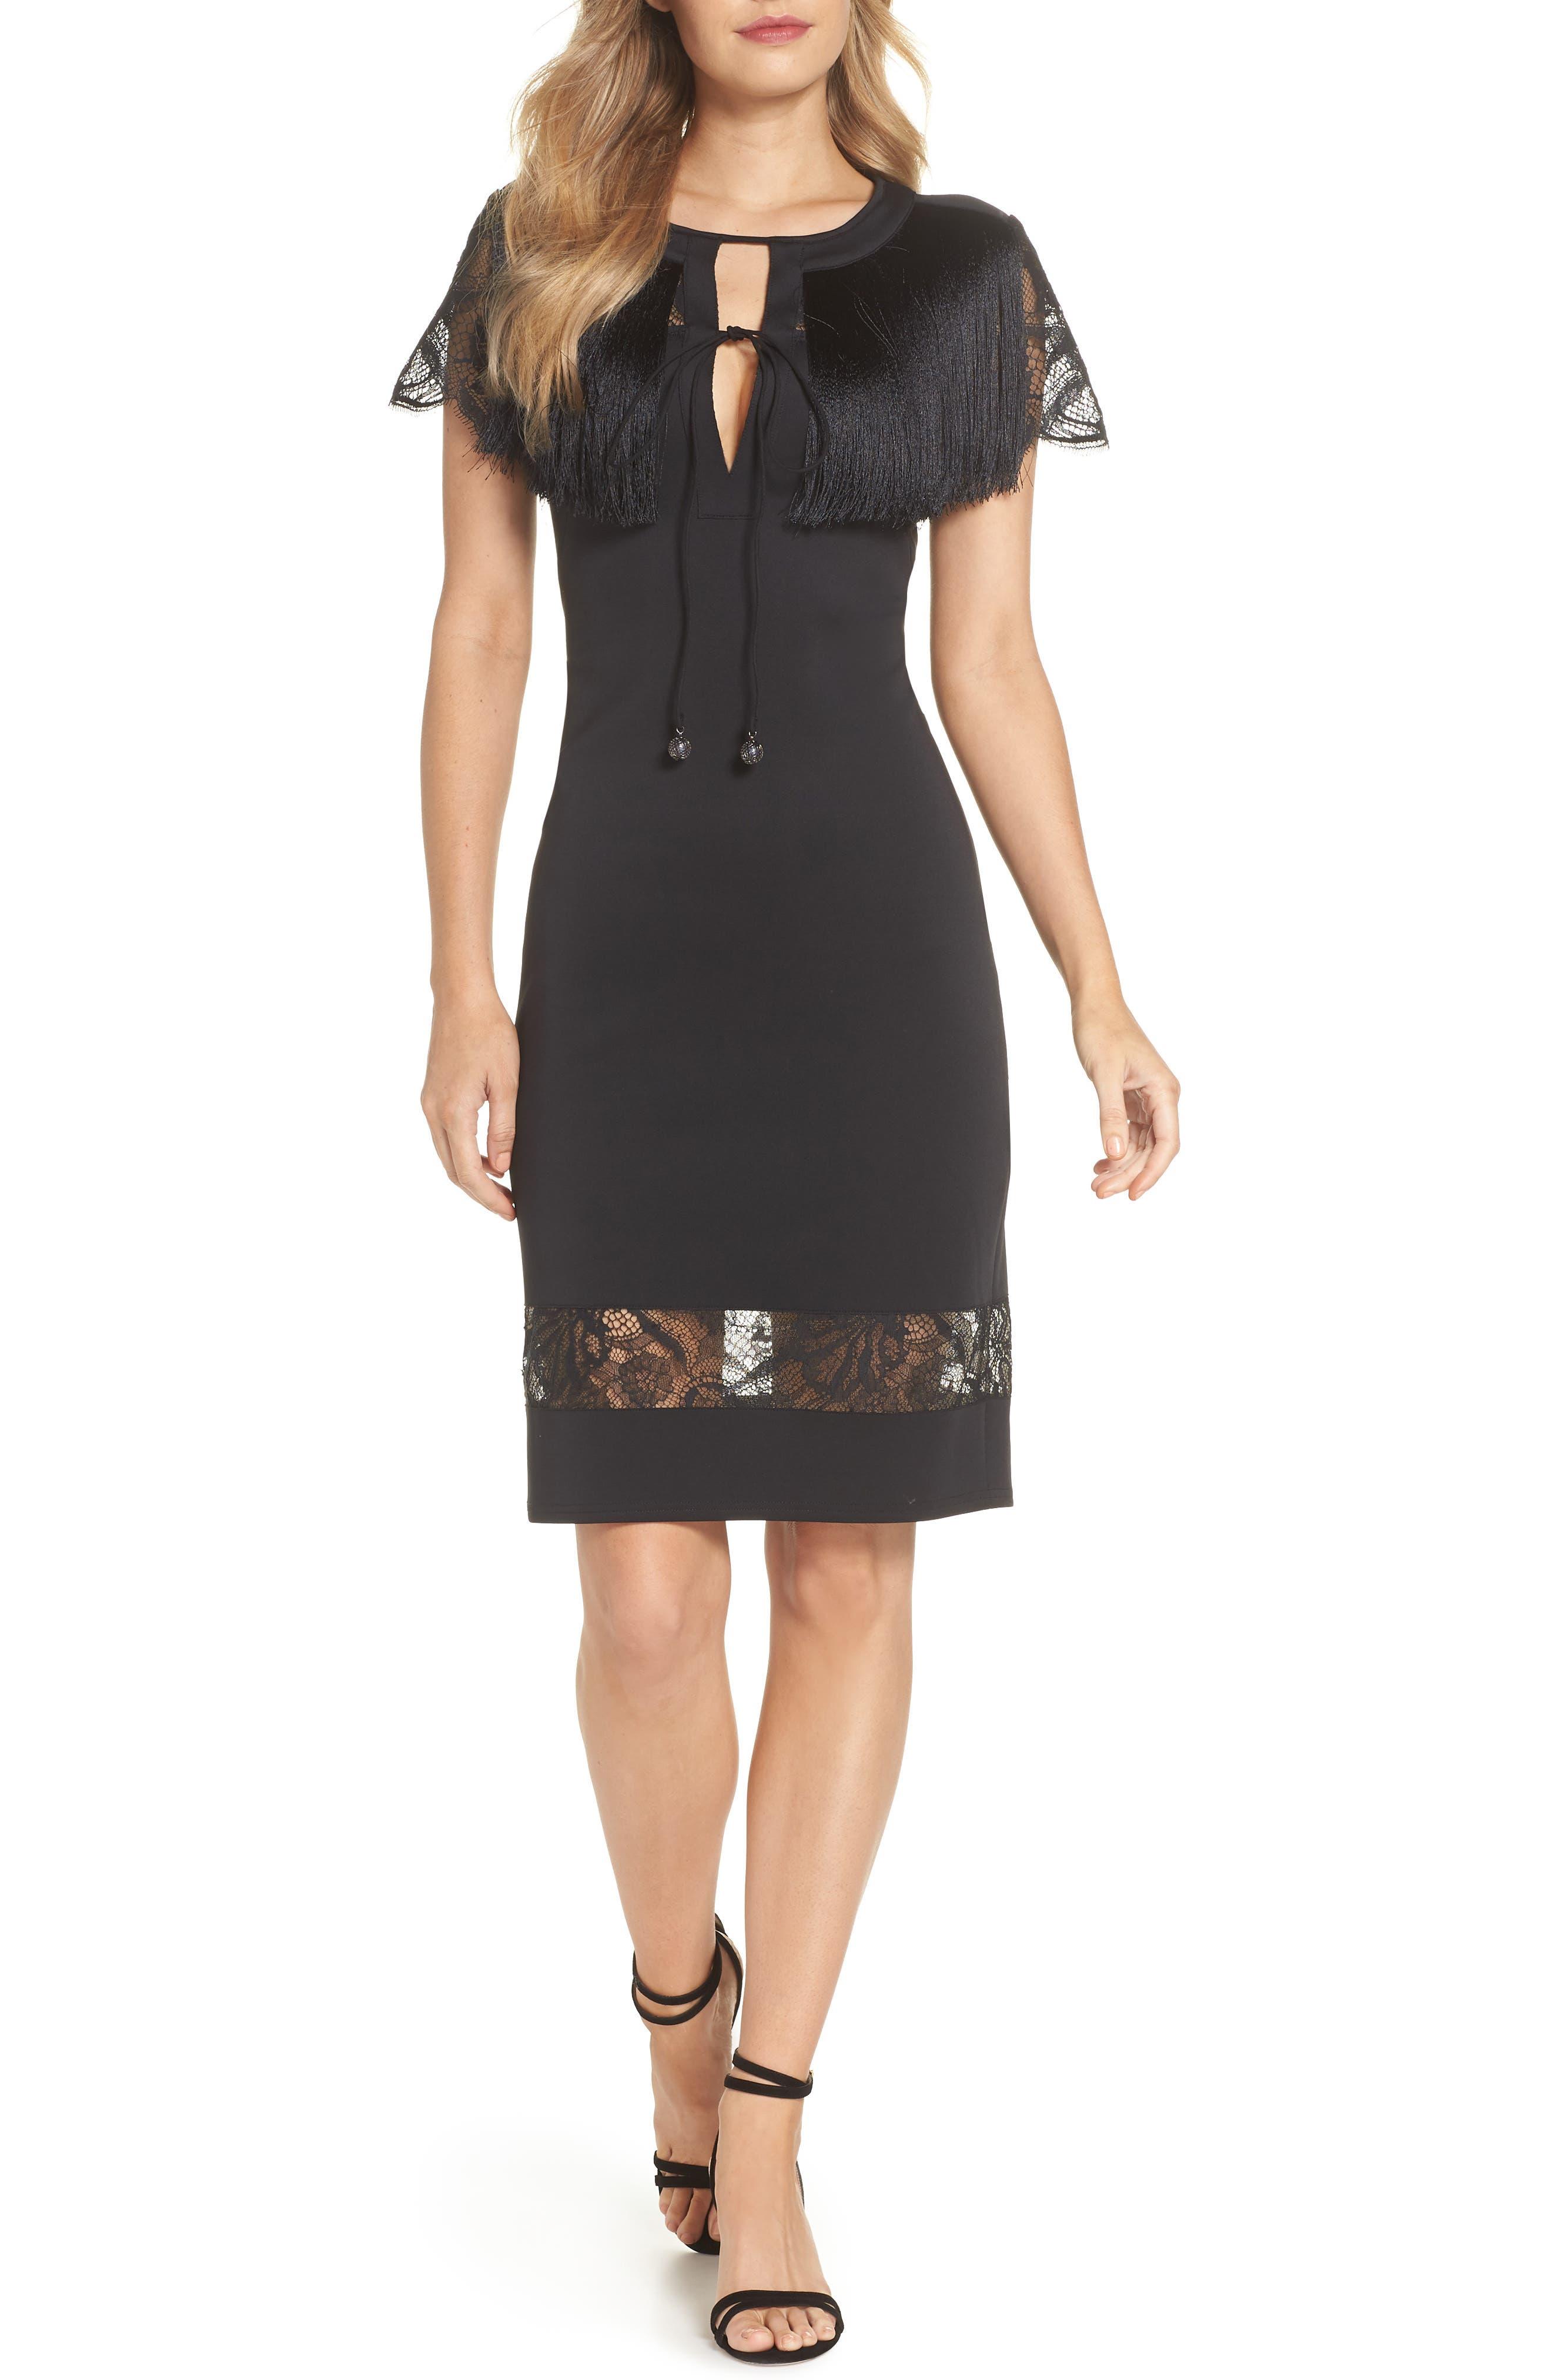 Tadashi Shoji Lace & Fringe Cocktail Dress, Black